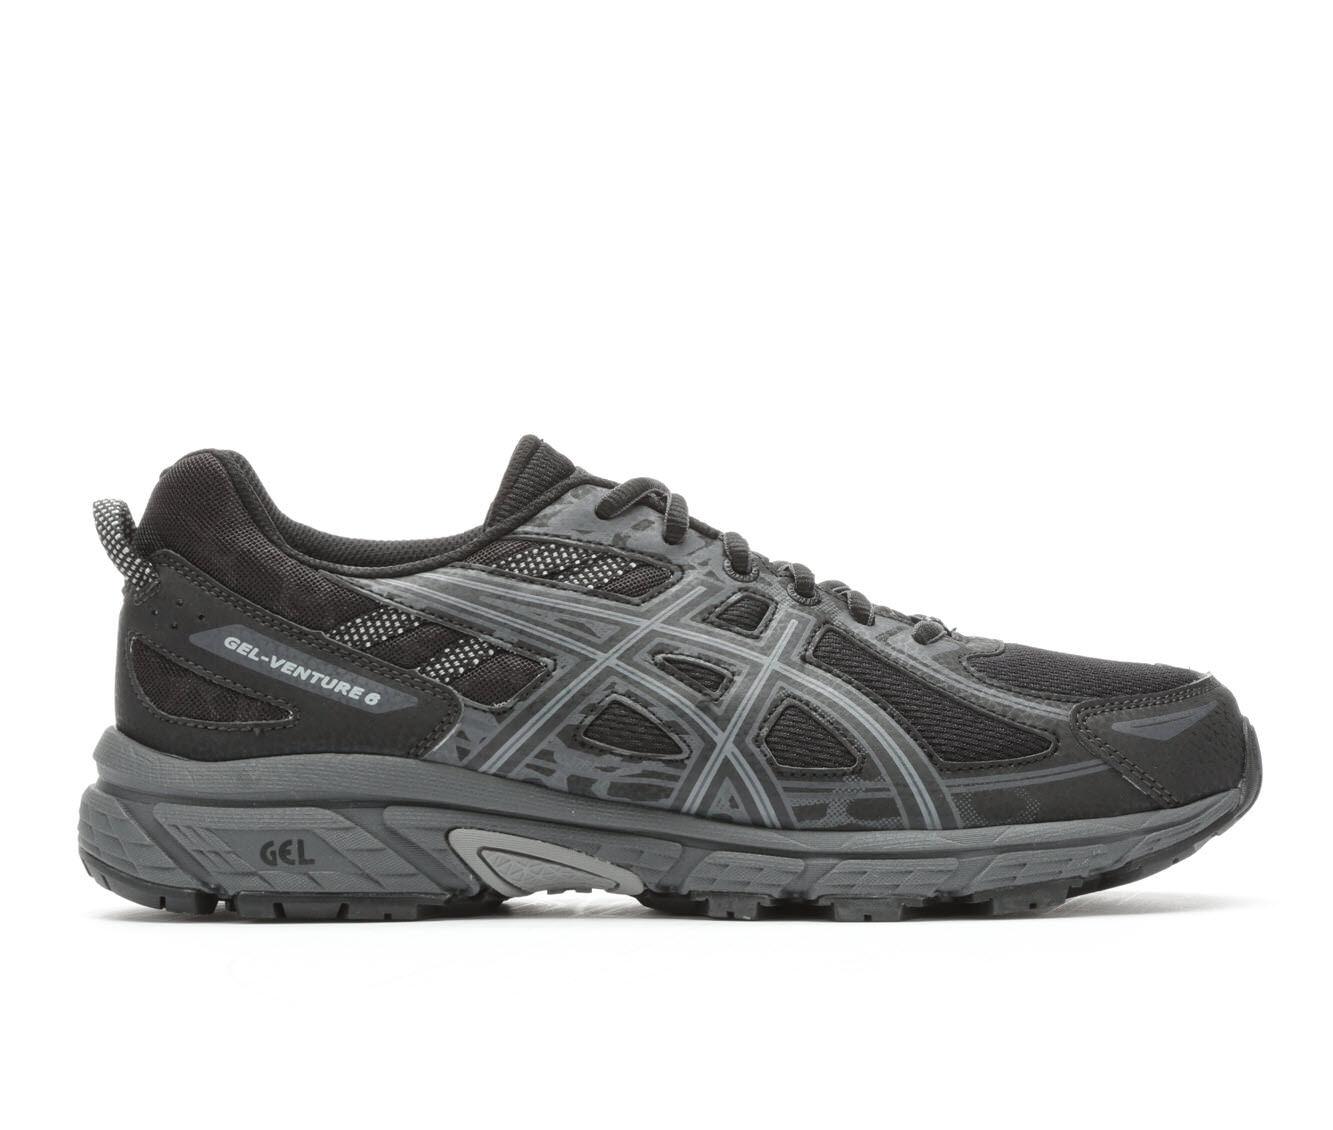 Men's ASICS Gel Venture 6 Trail Running Shoes Black/Gry Print